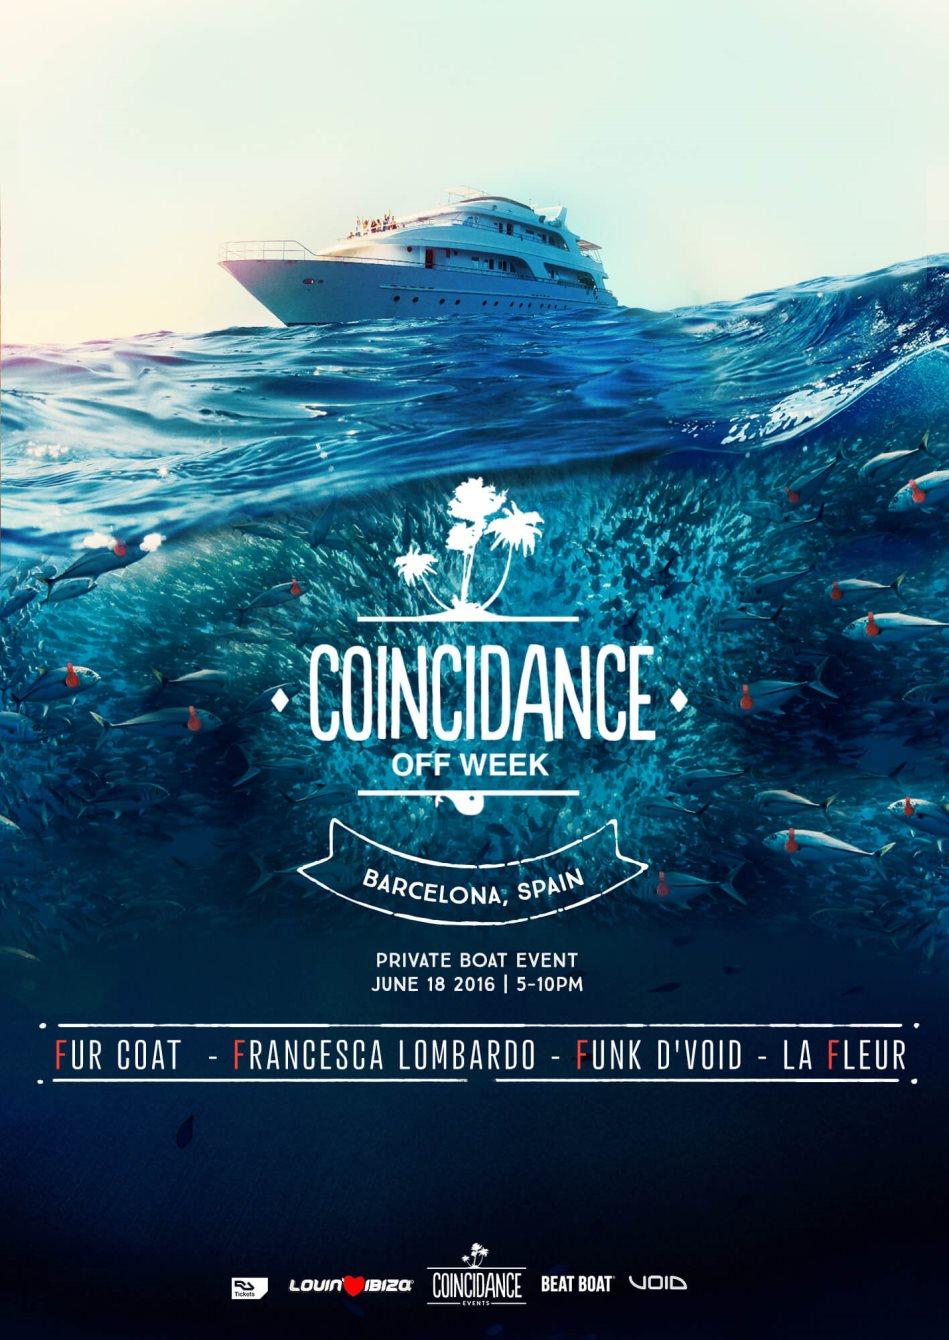 Coincidance Off Week with Fur Coat, Francesca Lombardo, La Fleur, Funk D'void - Flyer front